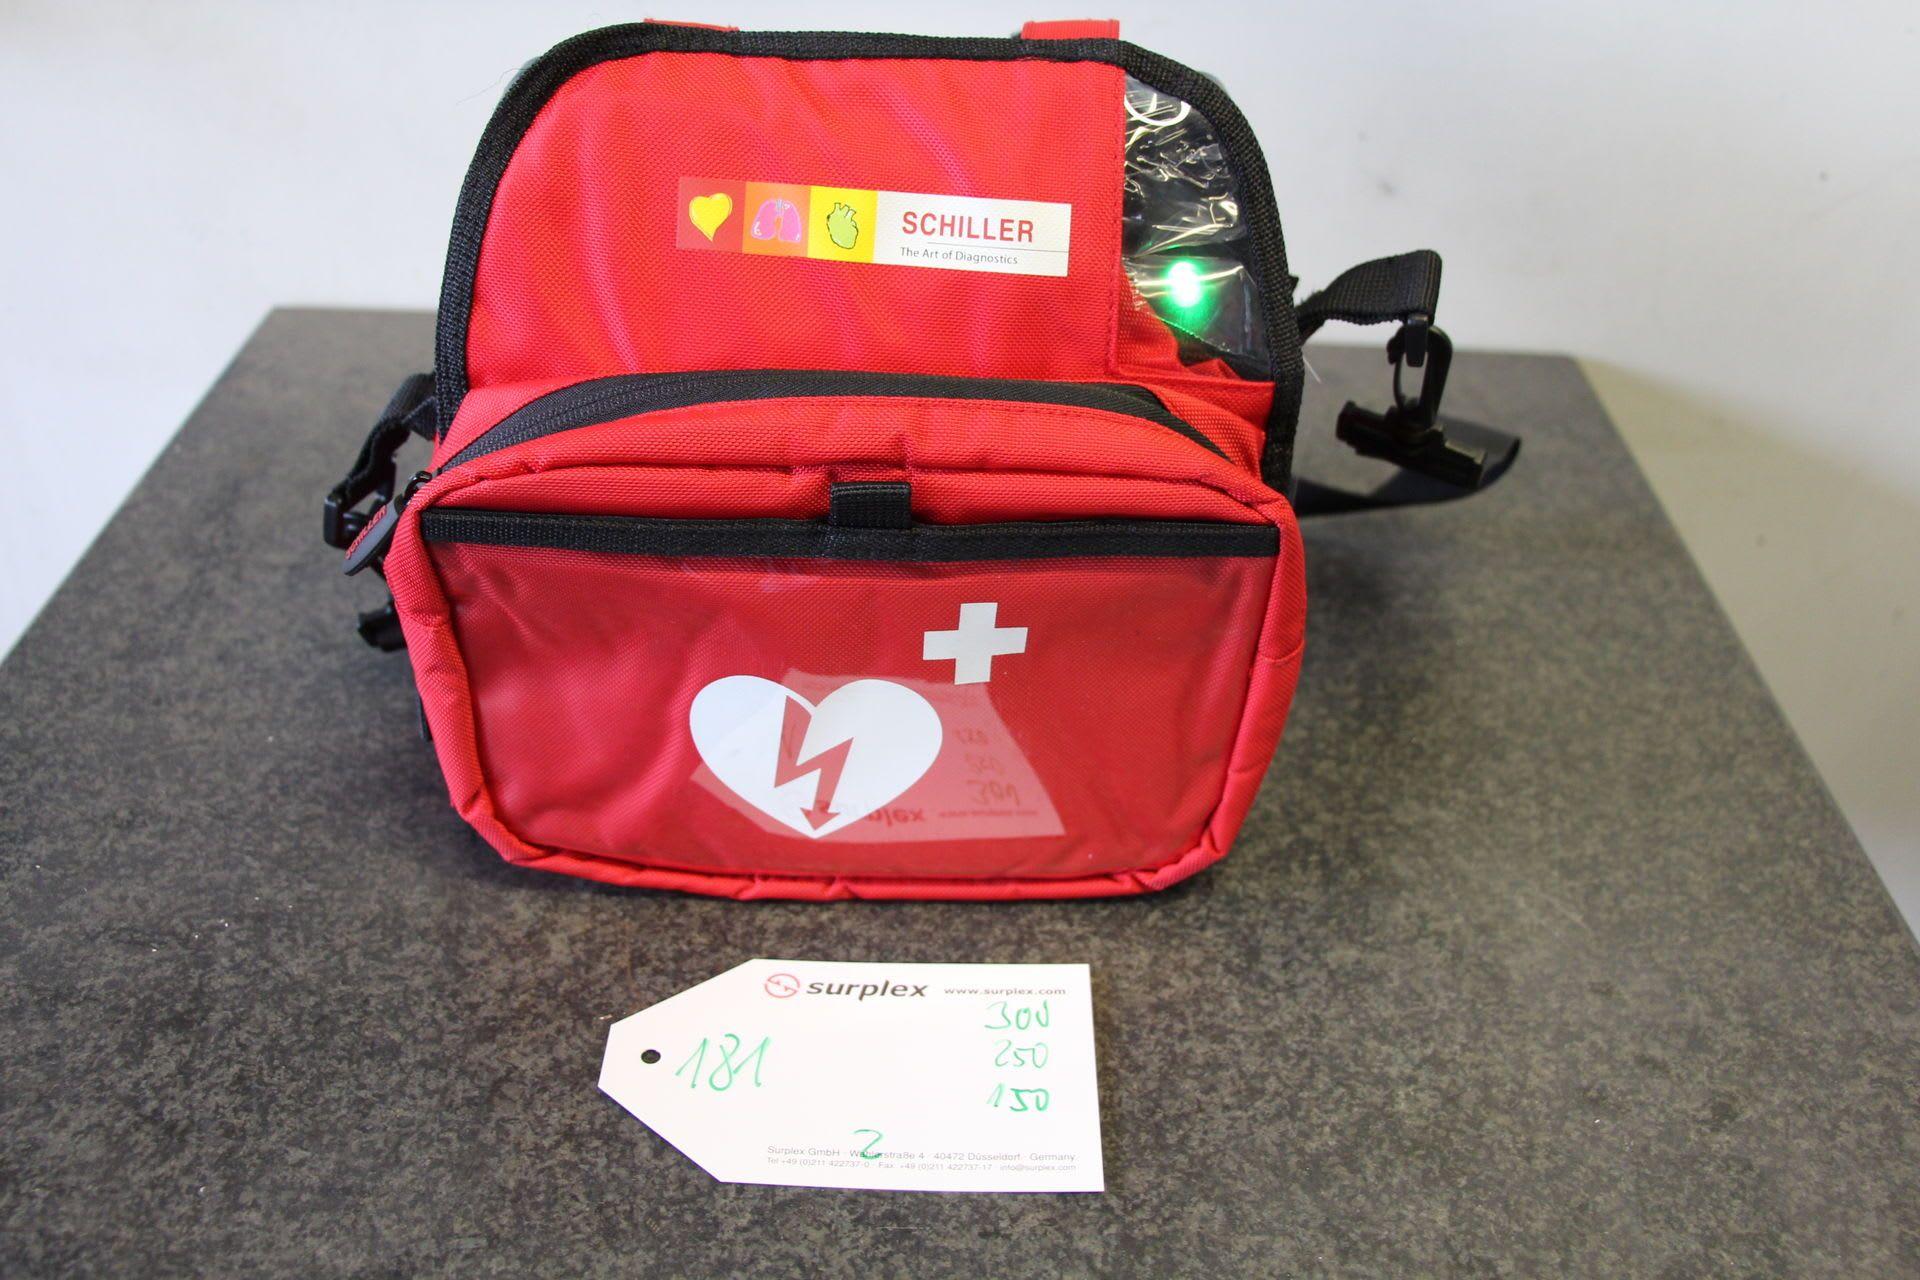 SCHILLER FRED EASY LIFE Defibrillator